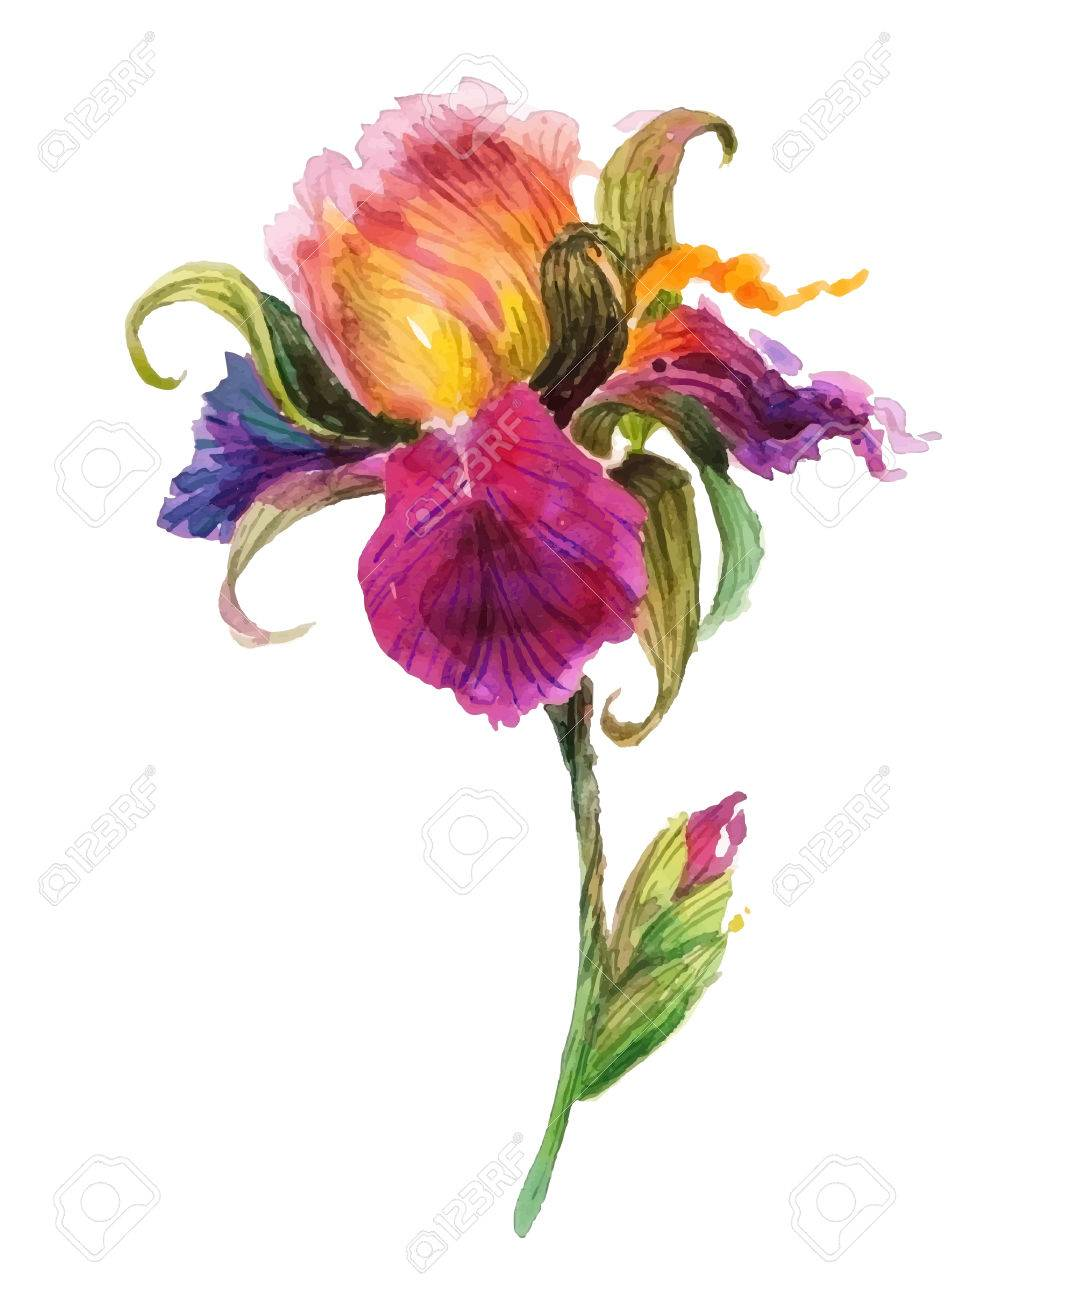 Beautiful watercolor iris flower watercolor floral illustration beautiful watercolor iris flower watercolor floral illustration stock vector 42045704 pronofoot35fo Choice Image